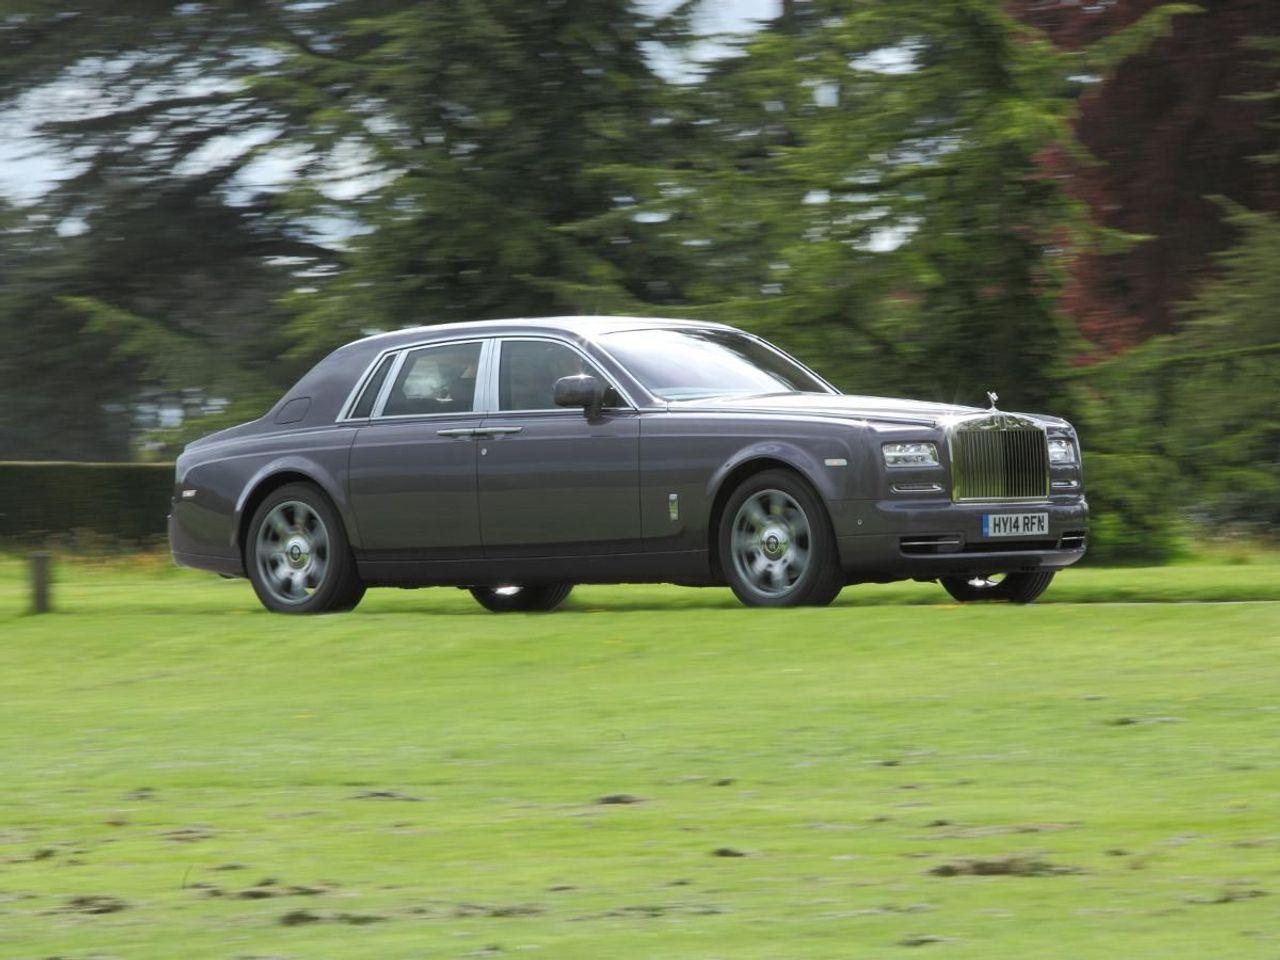 Rolls-Royce Phantom saloon